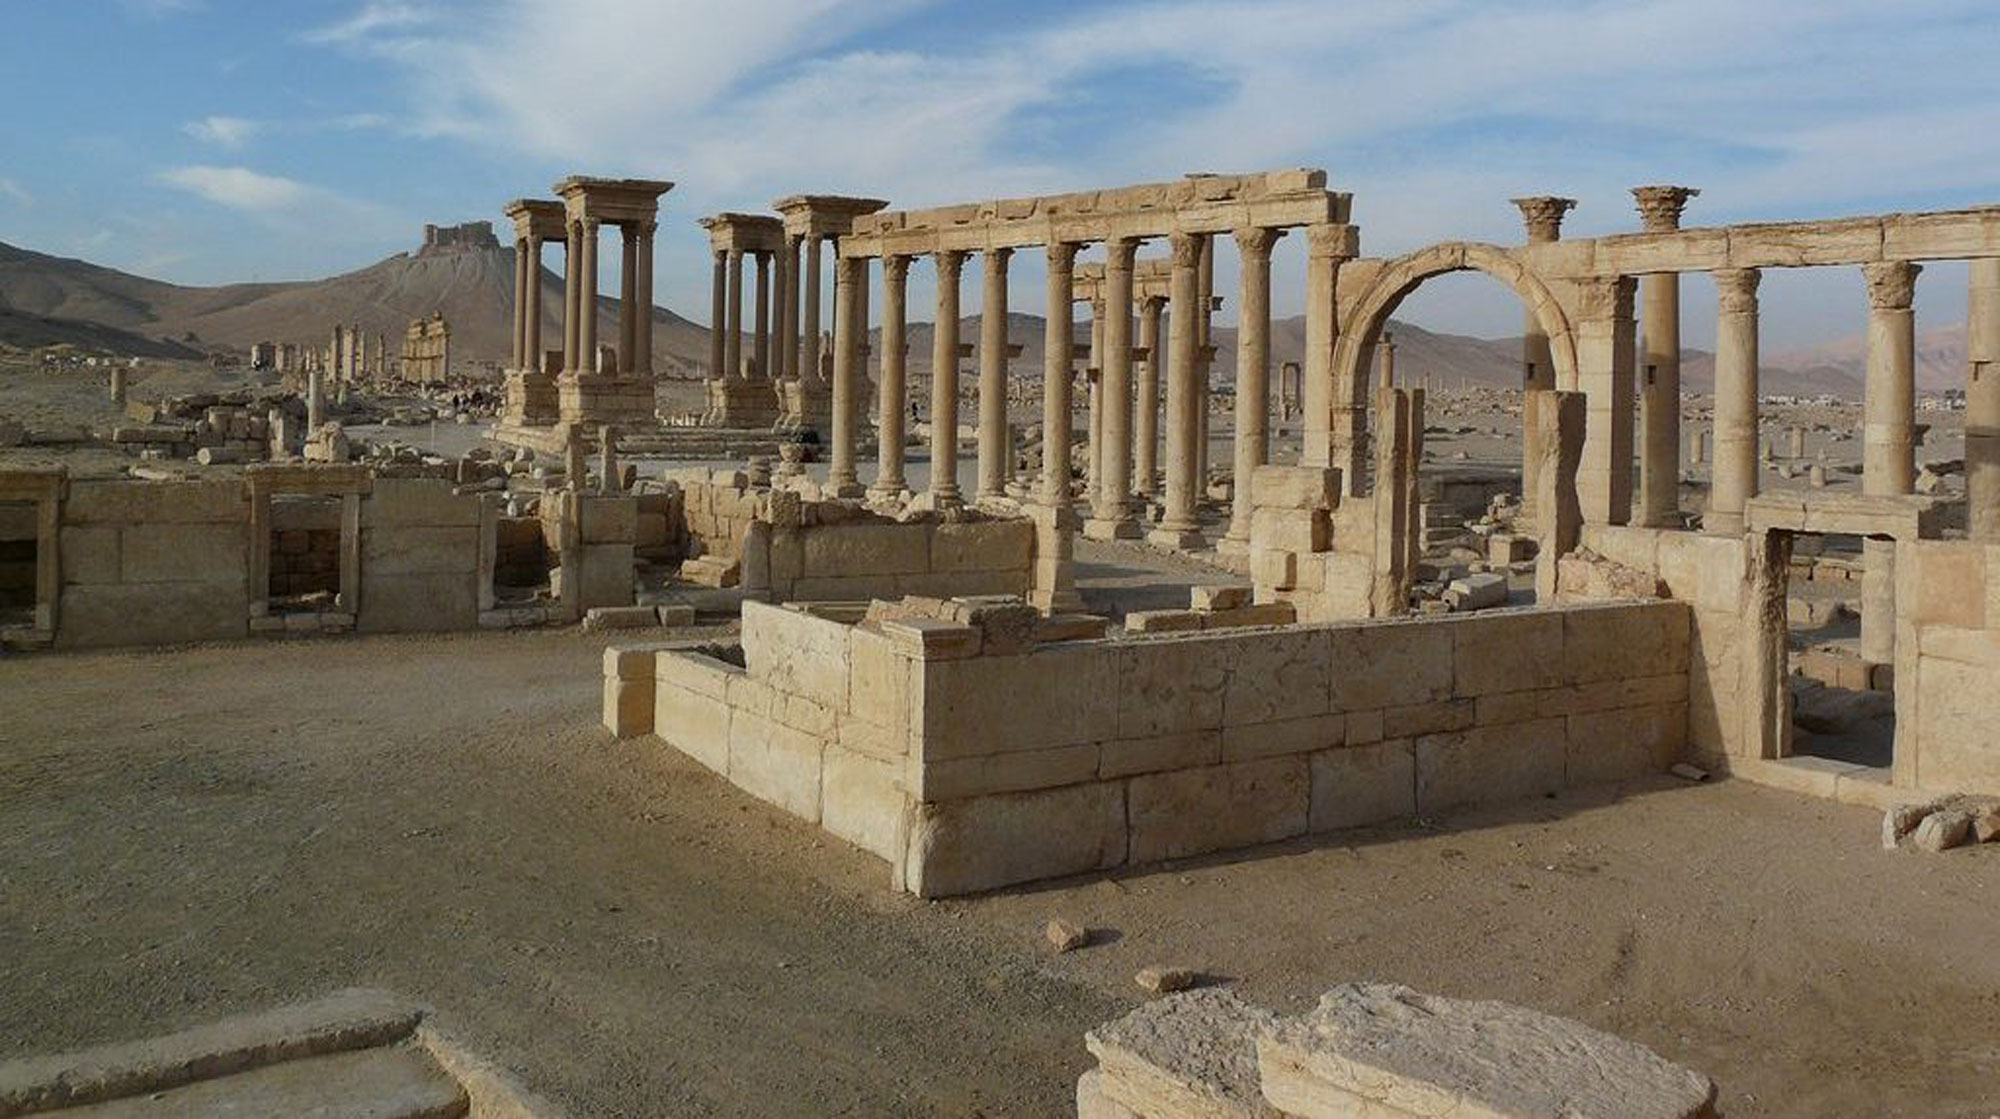 Palmyra-Flicr-@Varun-Shiv-Kapur-e1467880254951